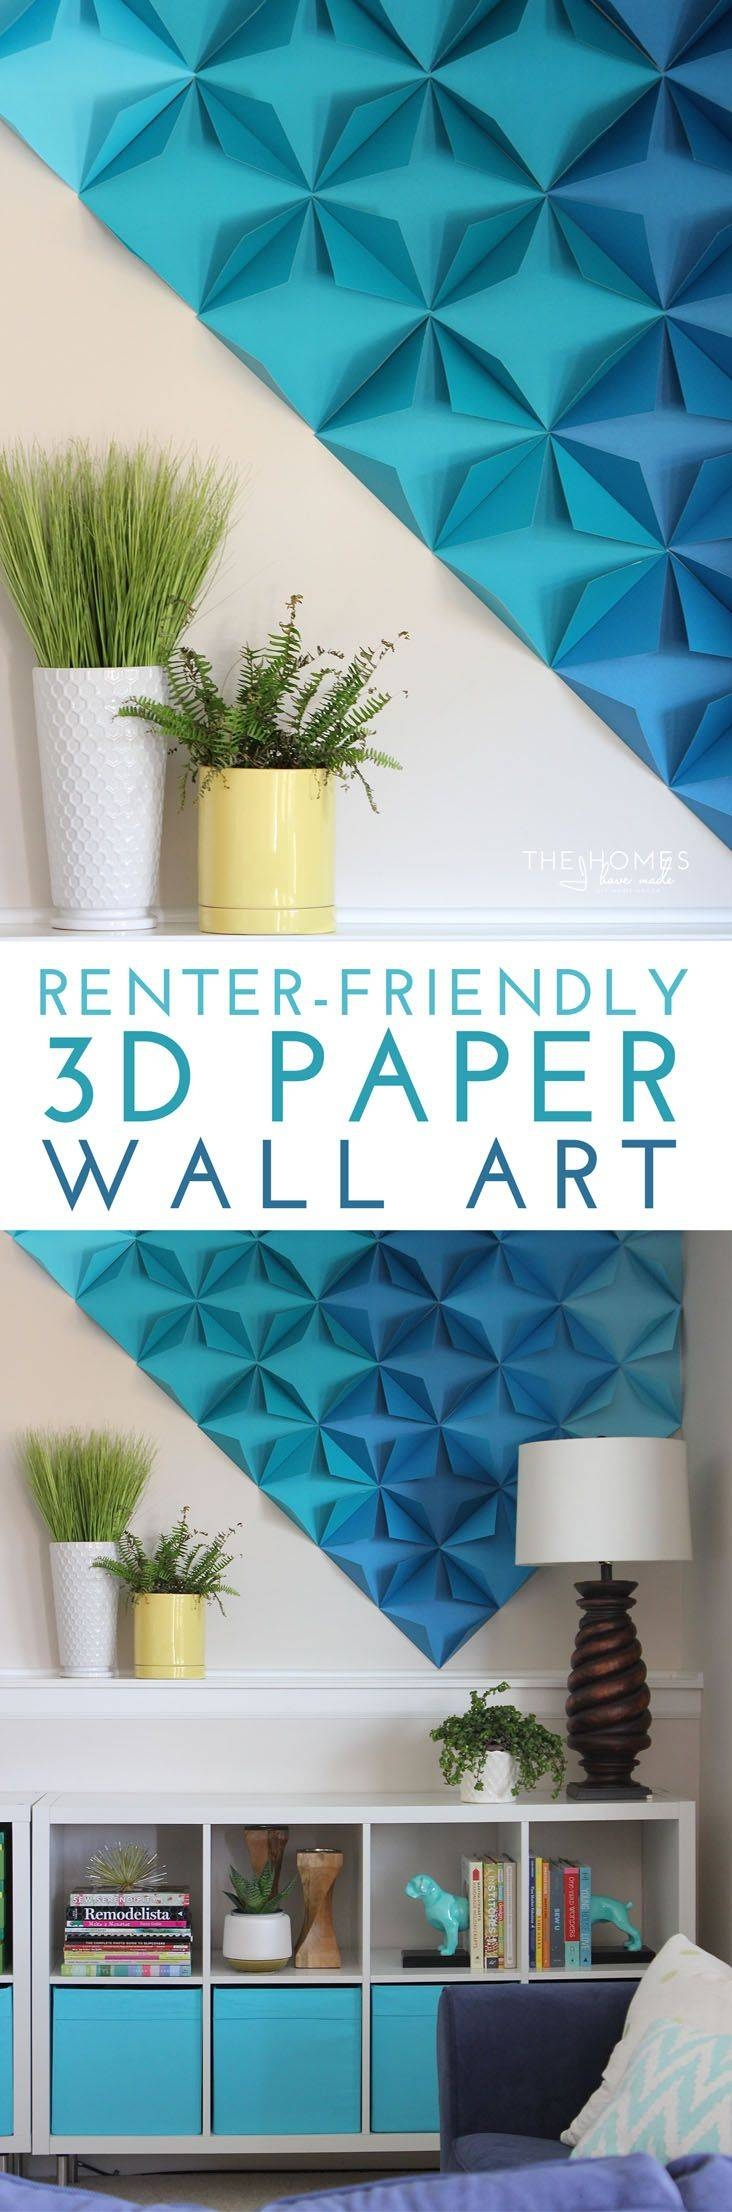 25+ Unique 3D Wall Art Ideas On Pinterest | Butterfly Wall, Diy Regarding Most Recent 3D Wall Art With Paper (View 2 of 20)